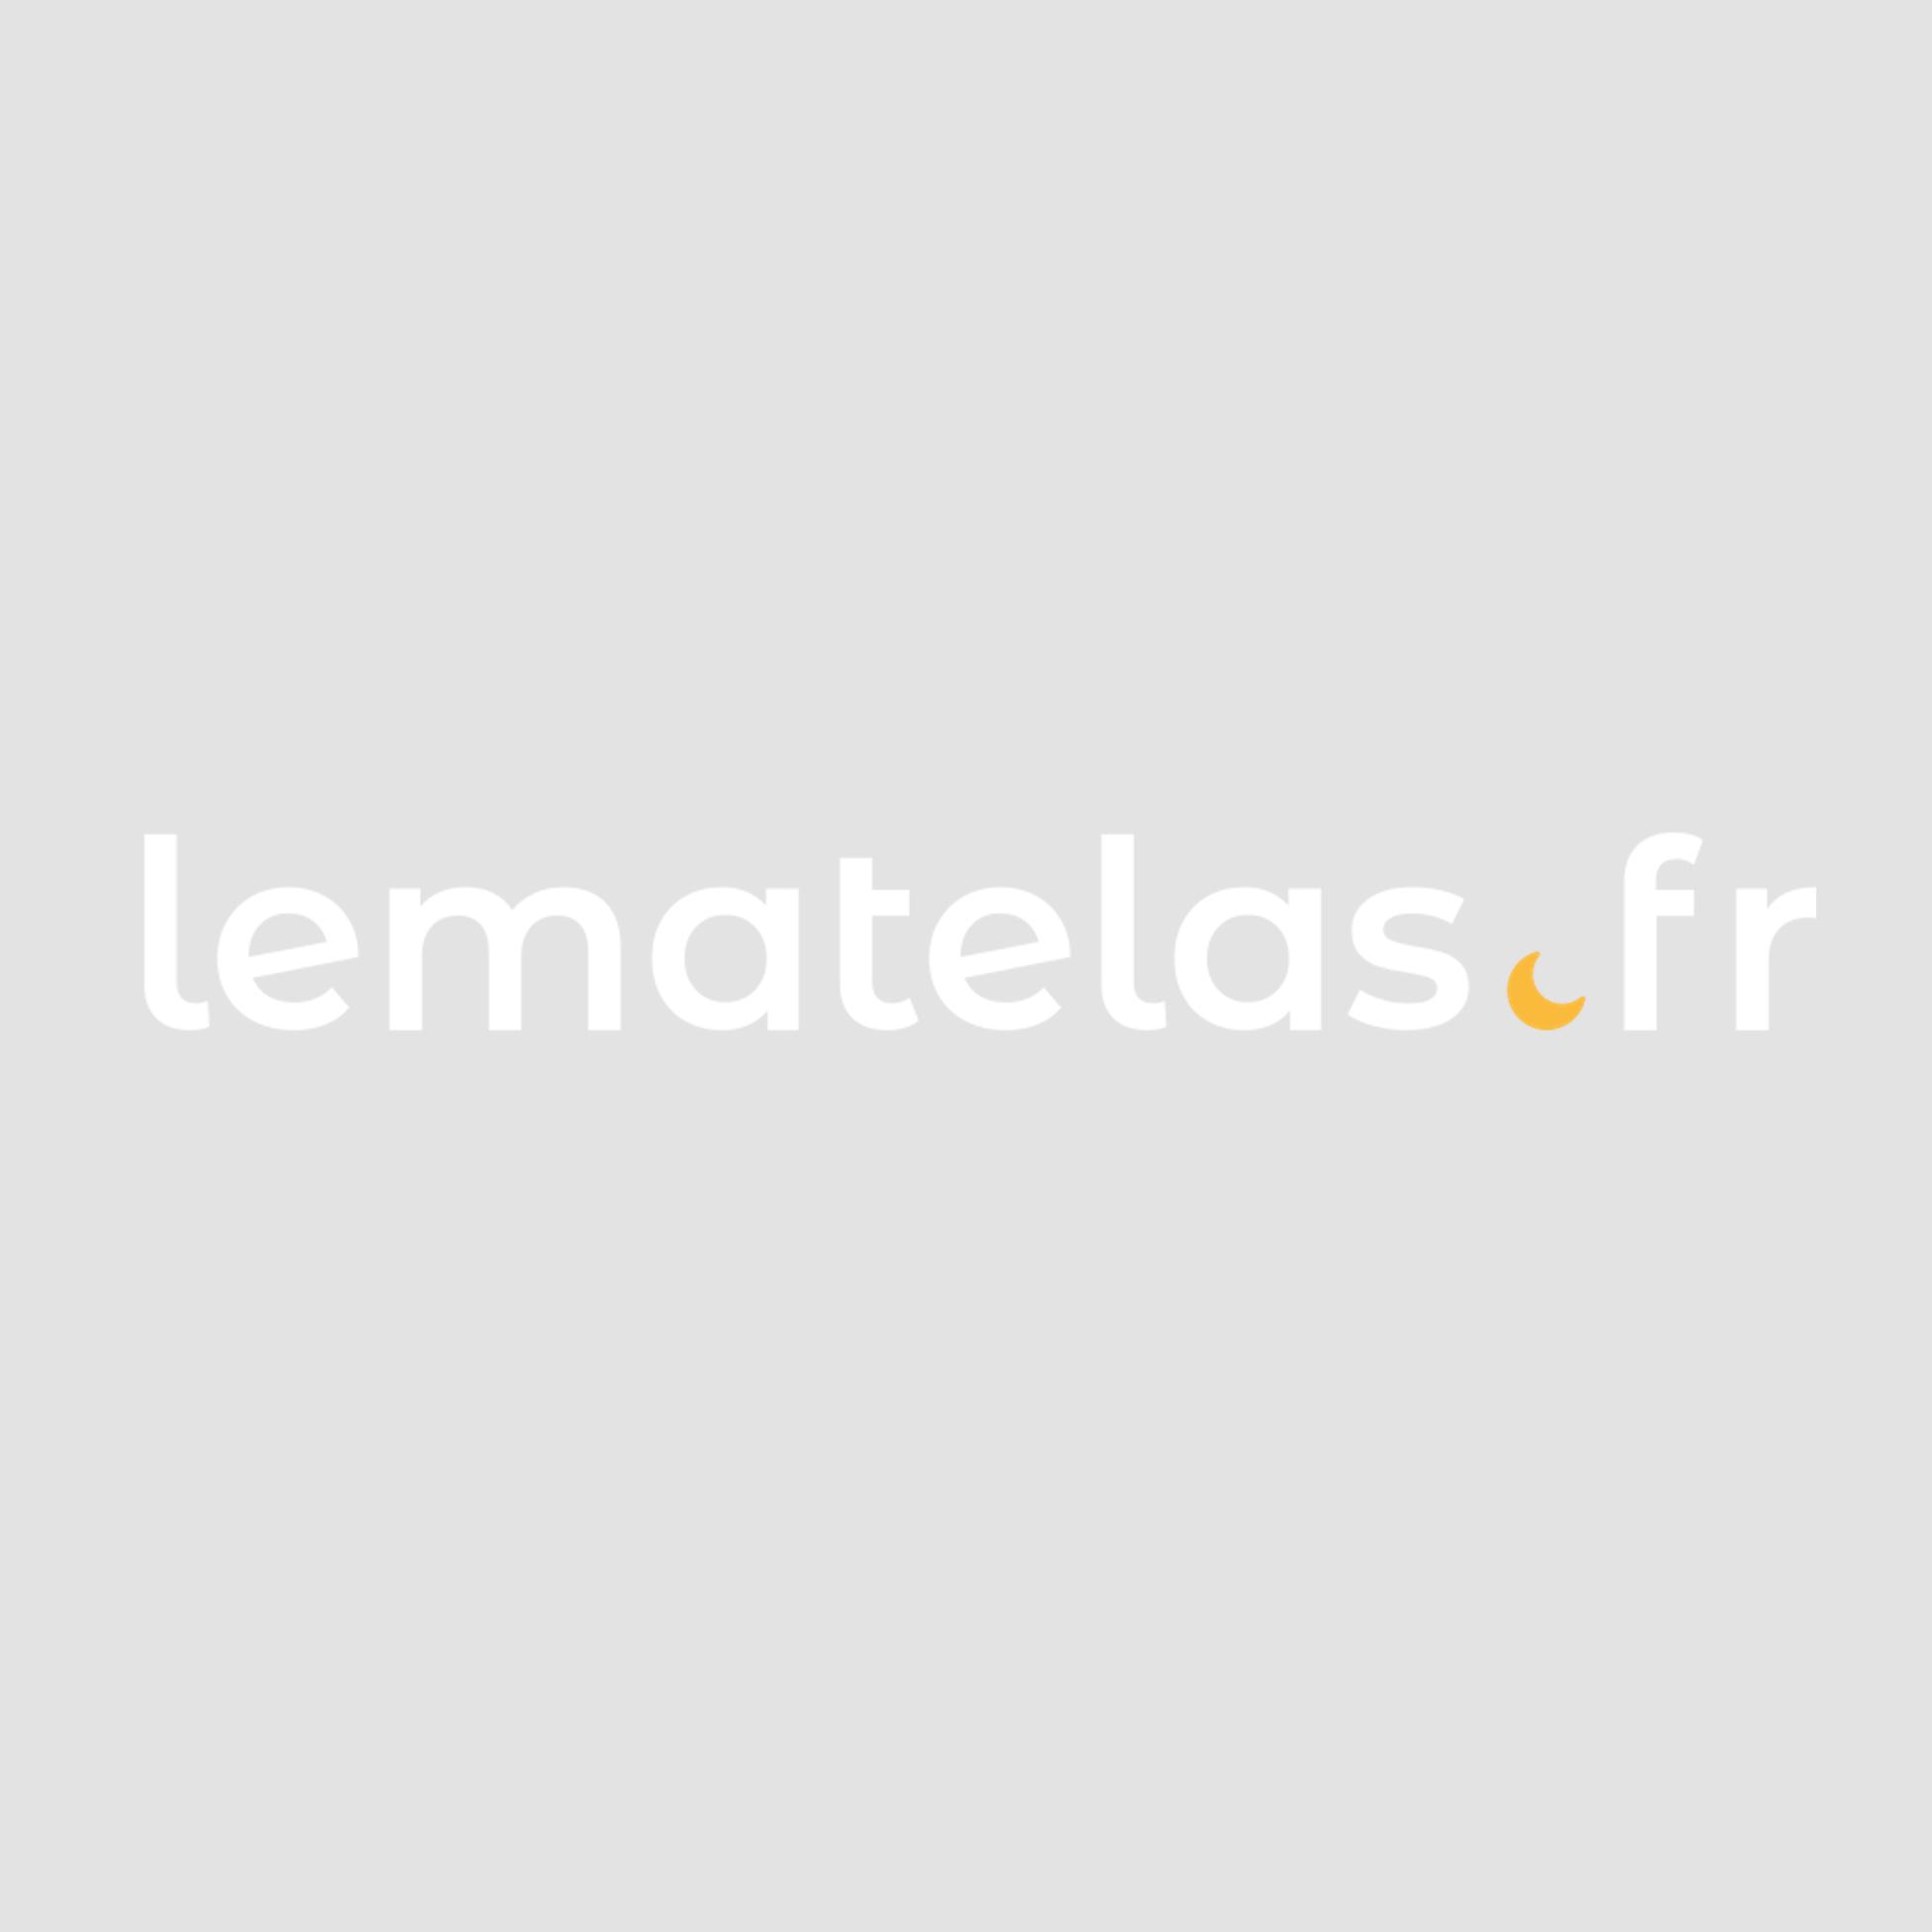 lit b b pliant h tre 60x120 h tellerie. Black Bedroom Furniture Sets. Home Design Ideas